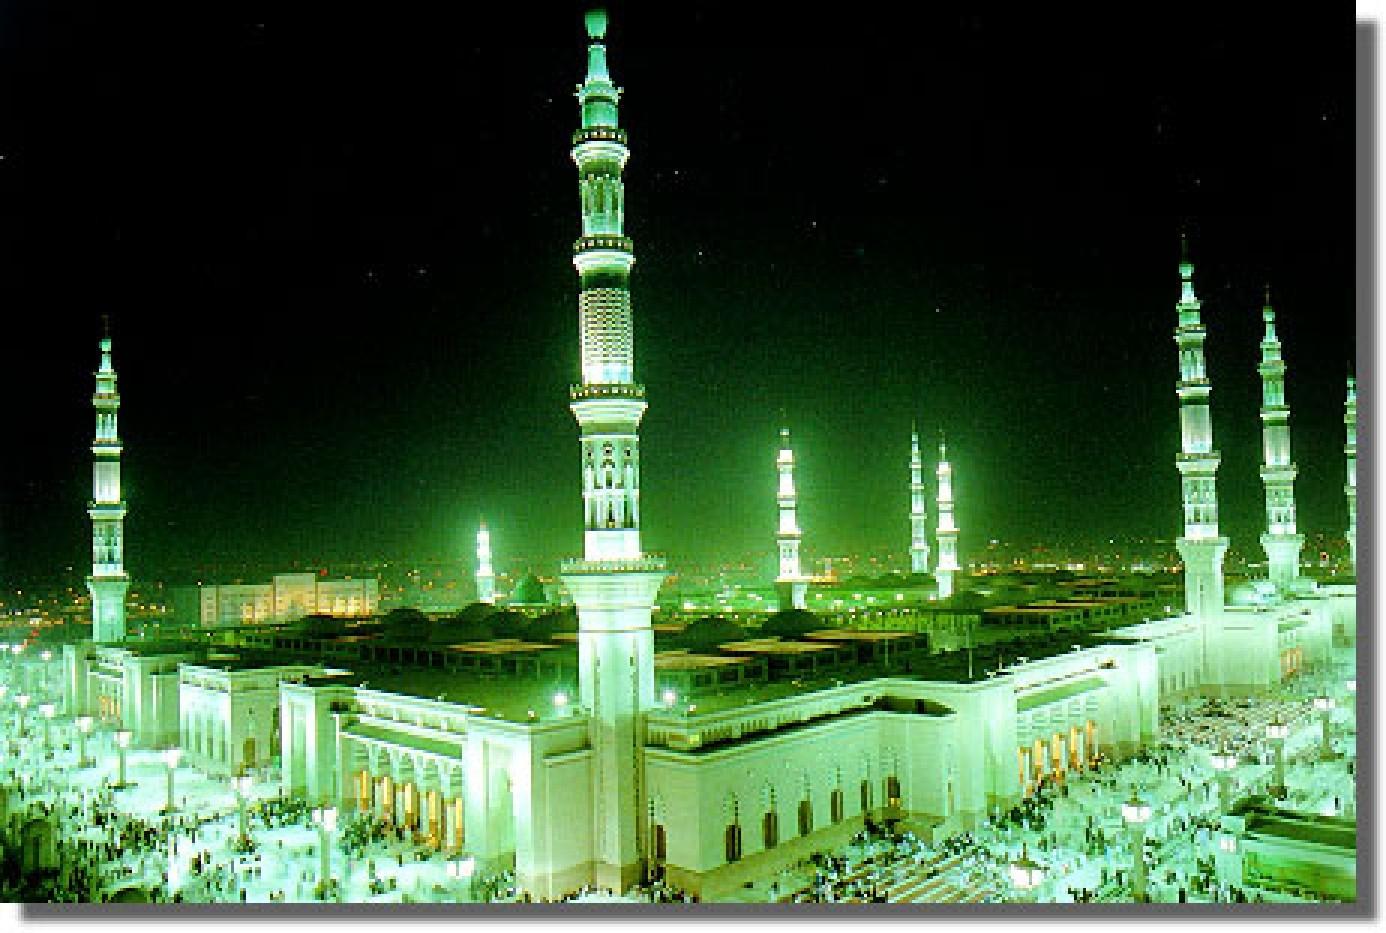 44+] Mosque HD Wallpapers 1080p on WallpaperSafari